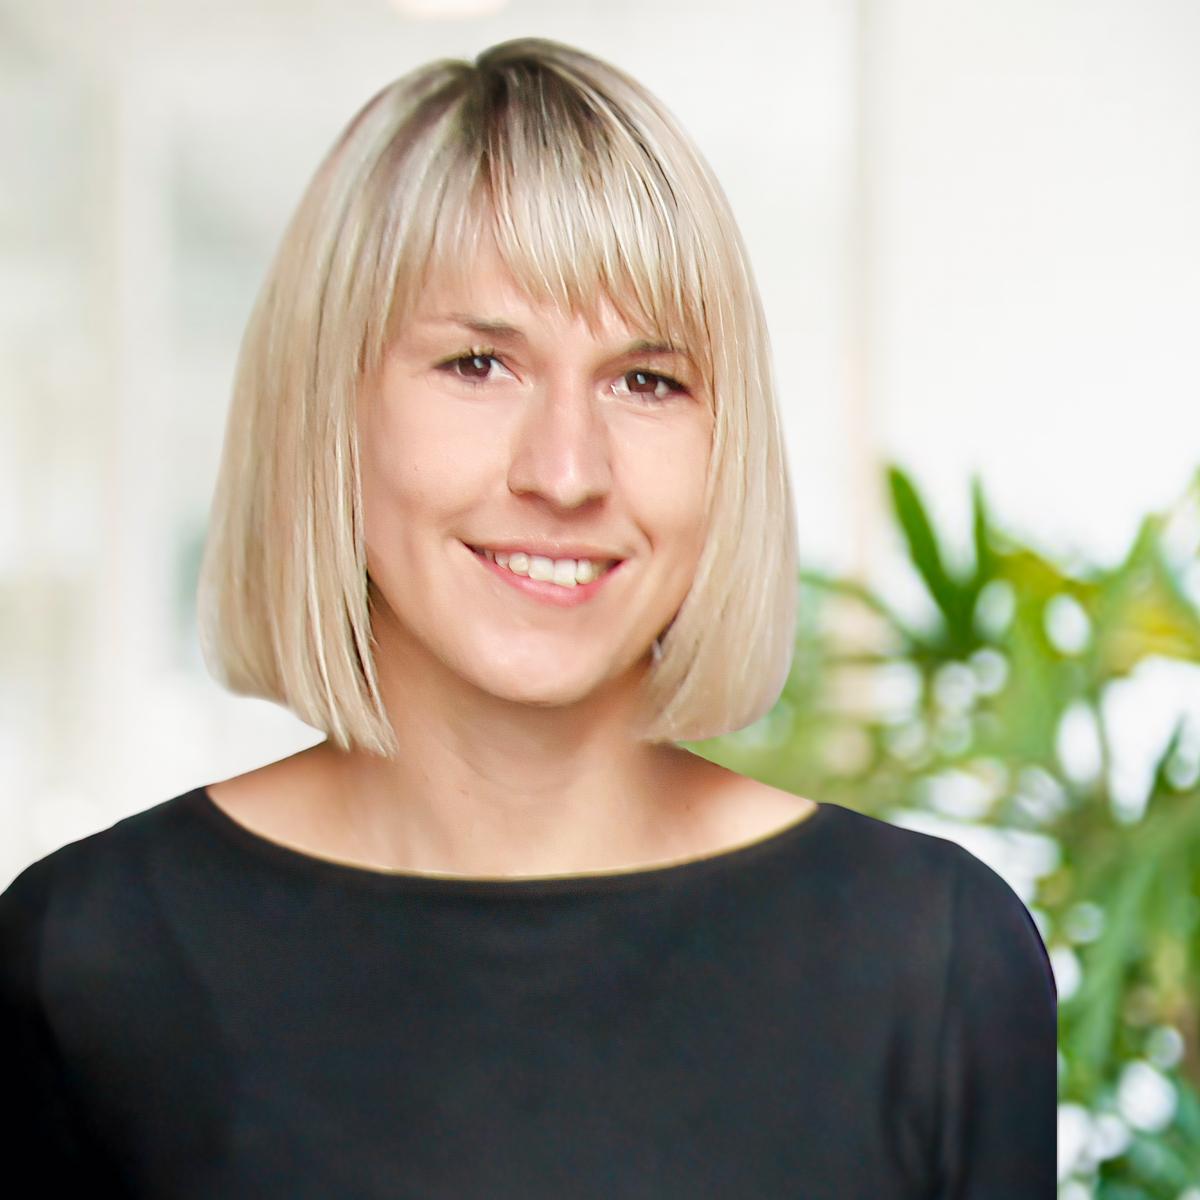 Sonja_Zillinger_web